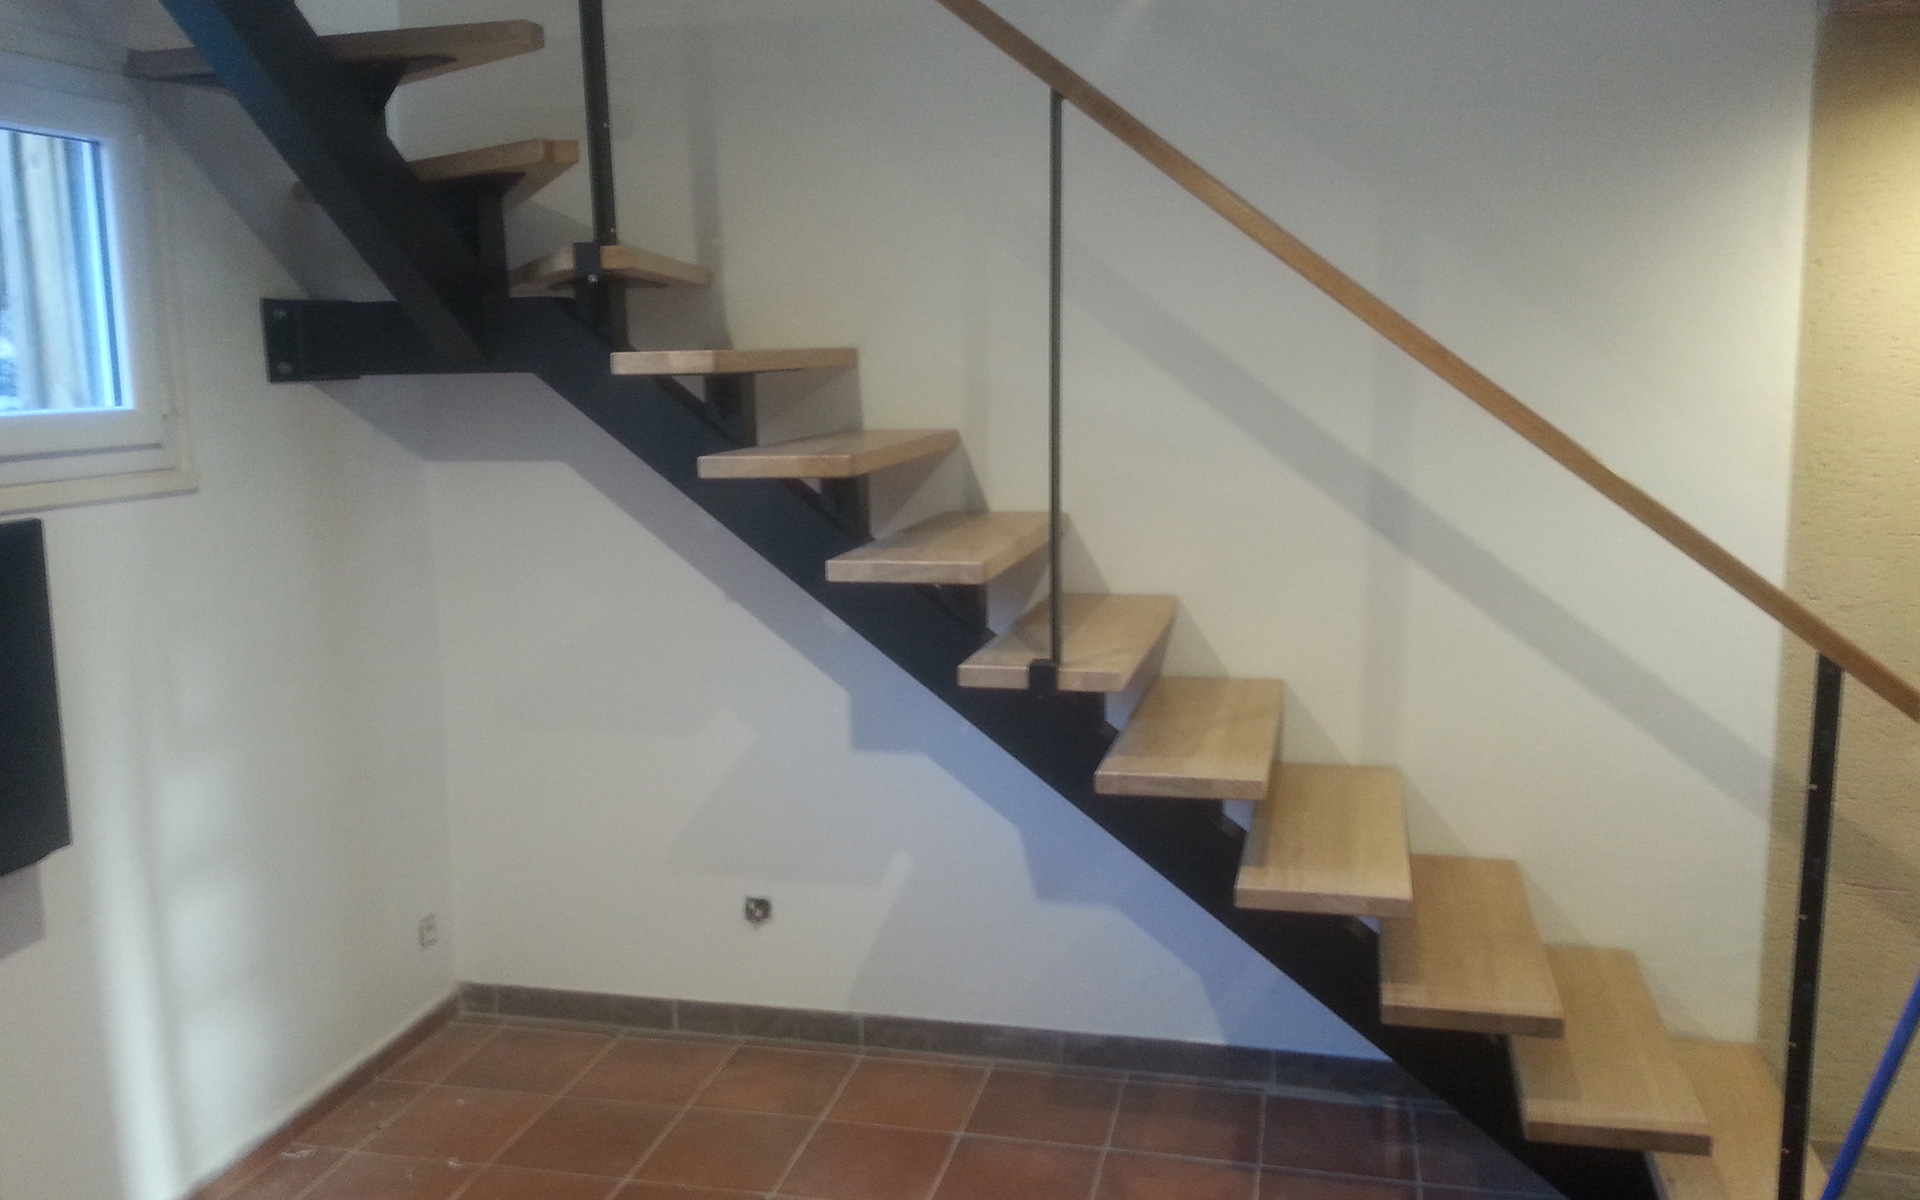 escalier-bois-metal-limon-central-pose-maison-particuliers-menuiserie-josselin-pleslin-trigavou-dinan-dinard-saint-malo